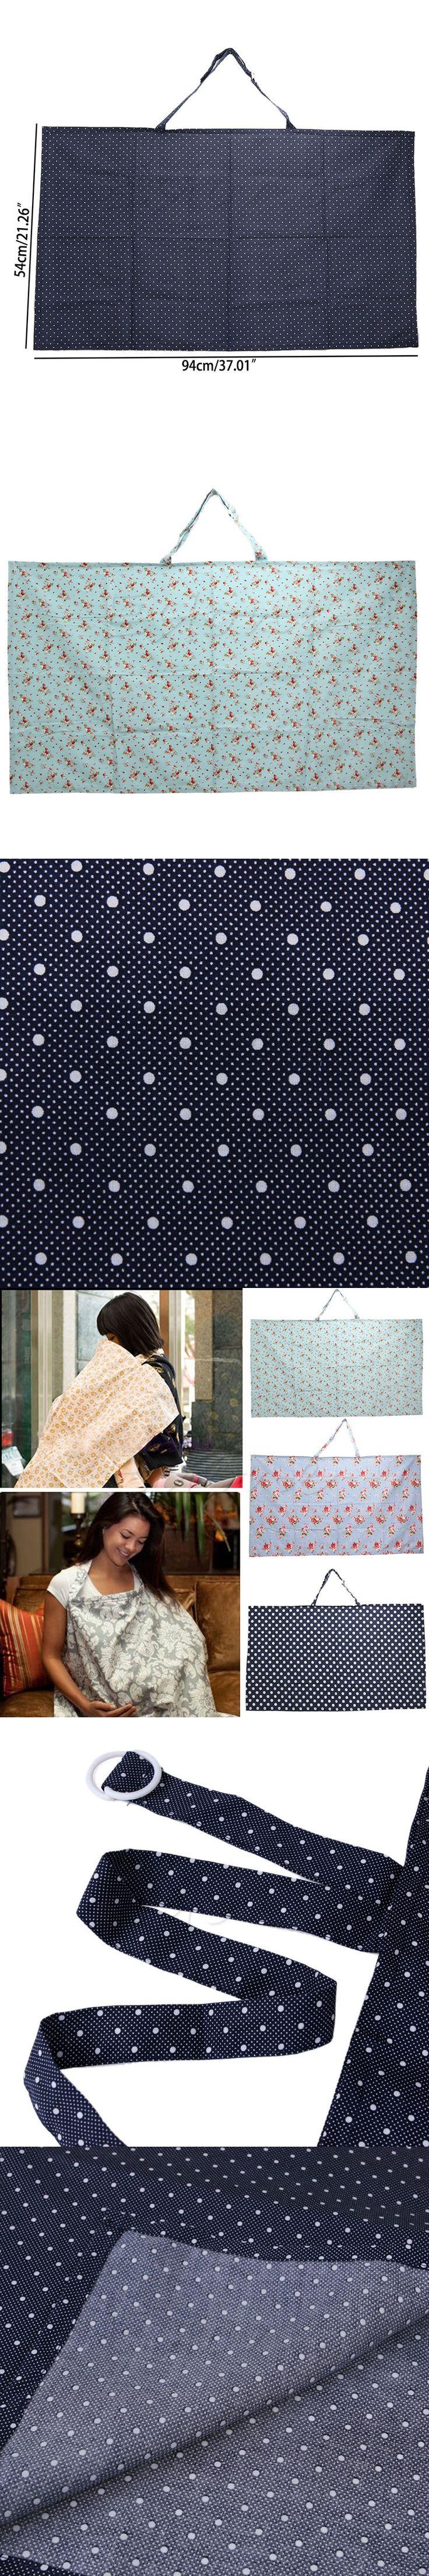 1Pc New Baby Mum Breastfeeding Nursing Udder Covers Poncho Cover Up Cotton Blanket Shawl